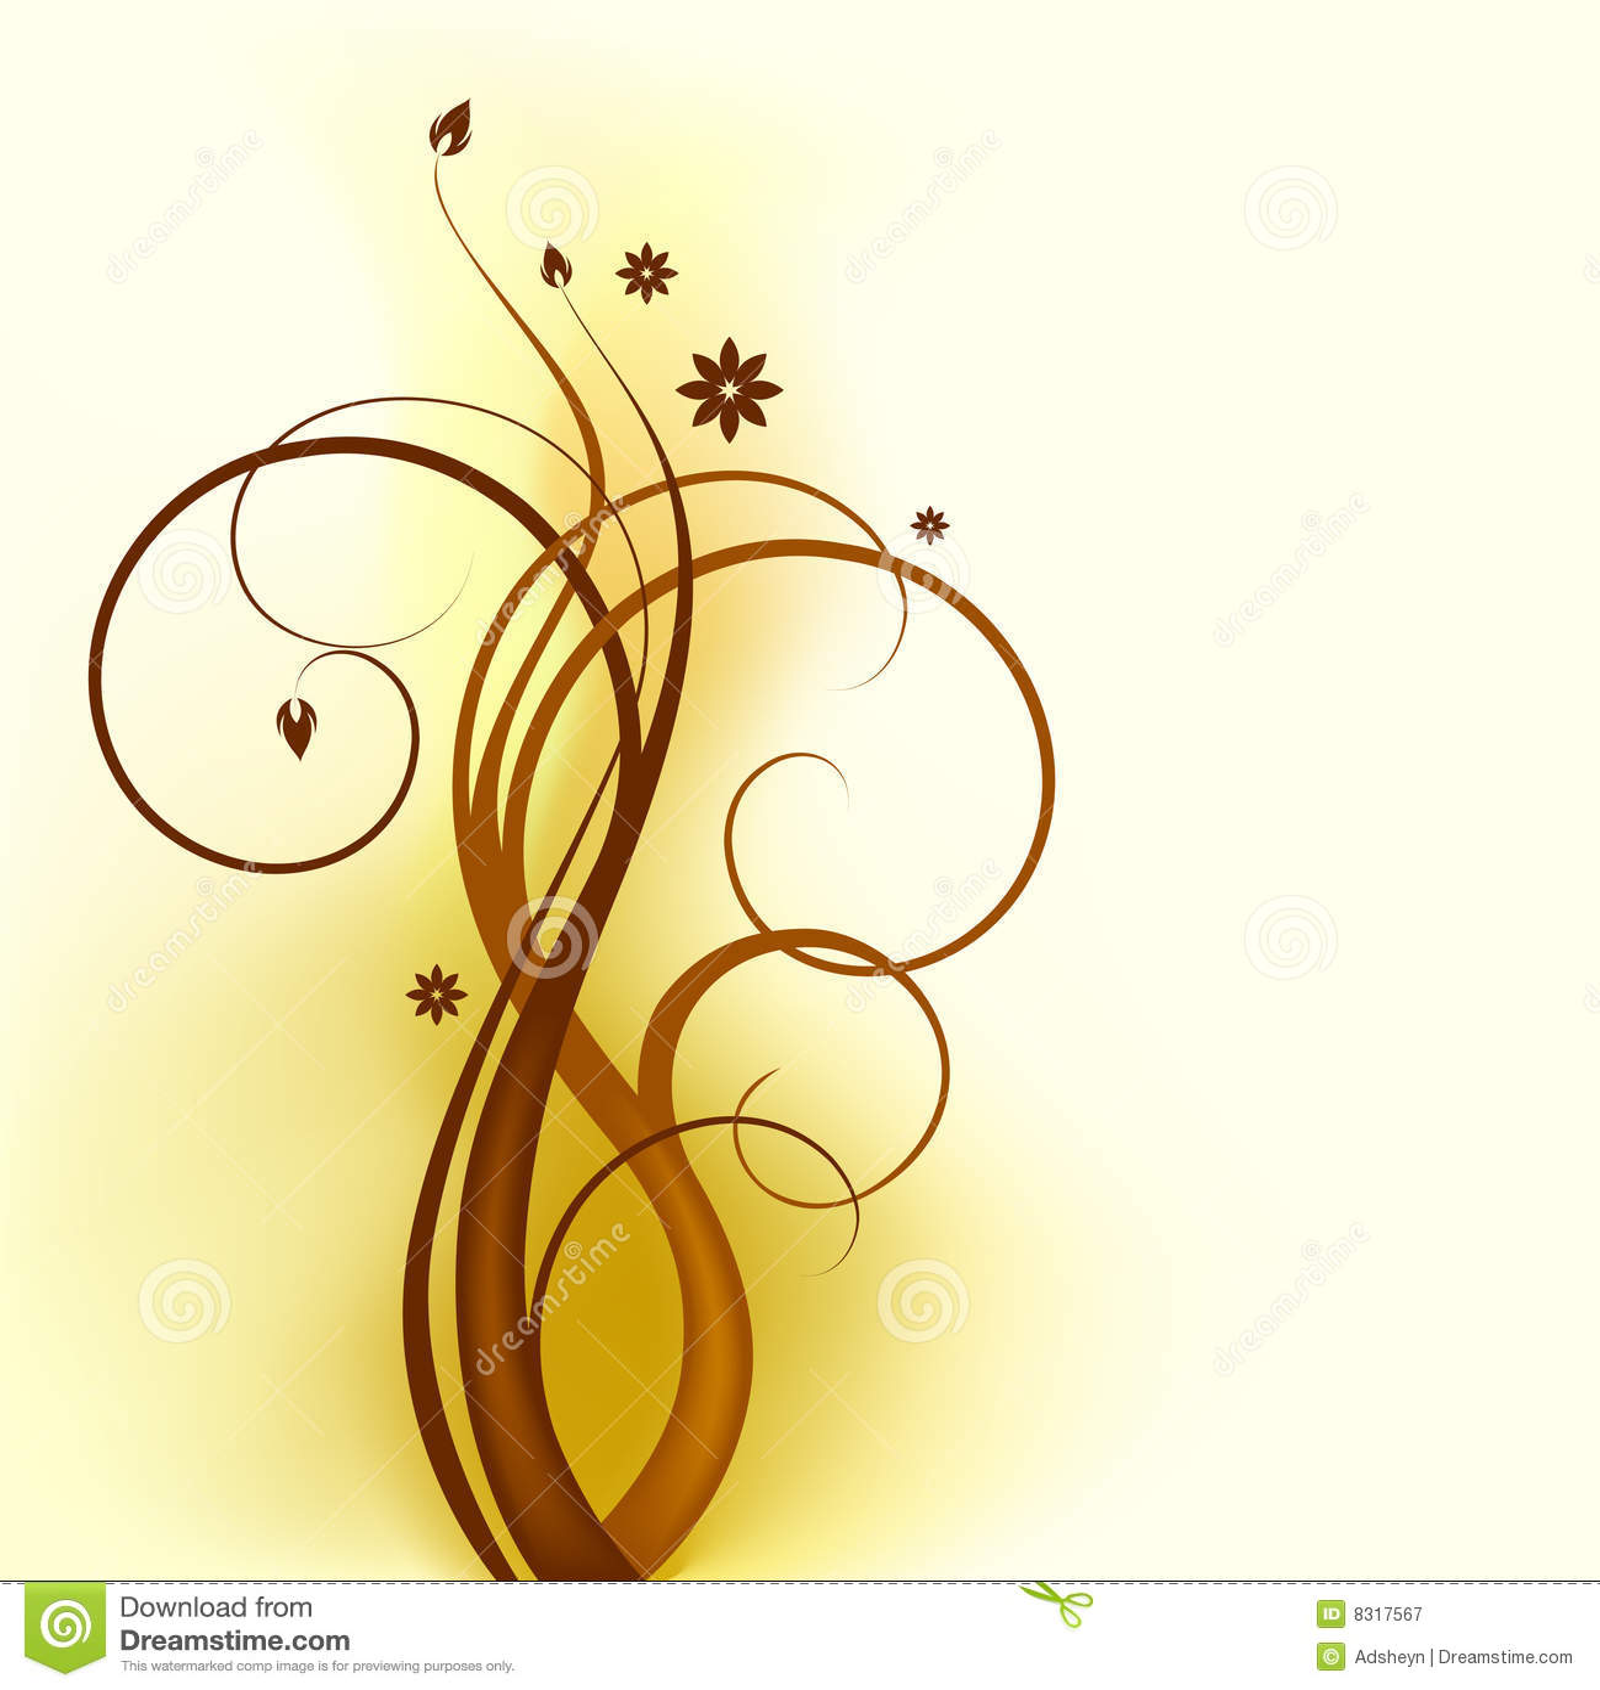 Brown_swirl_design